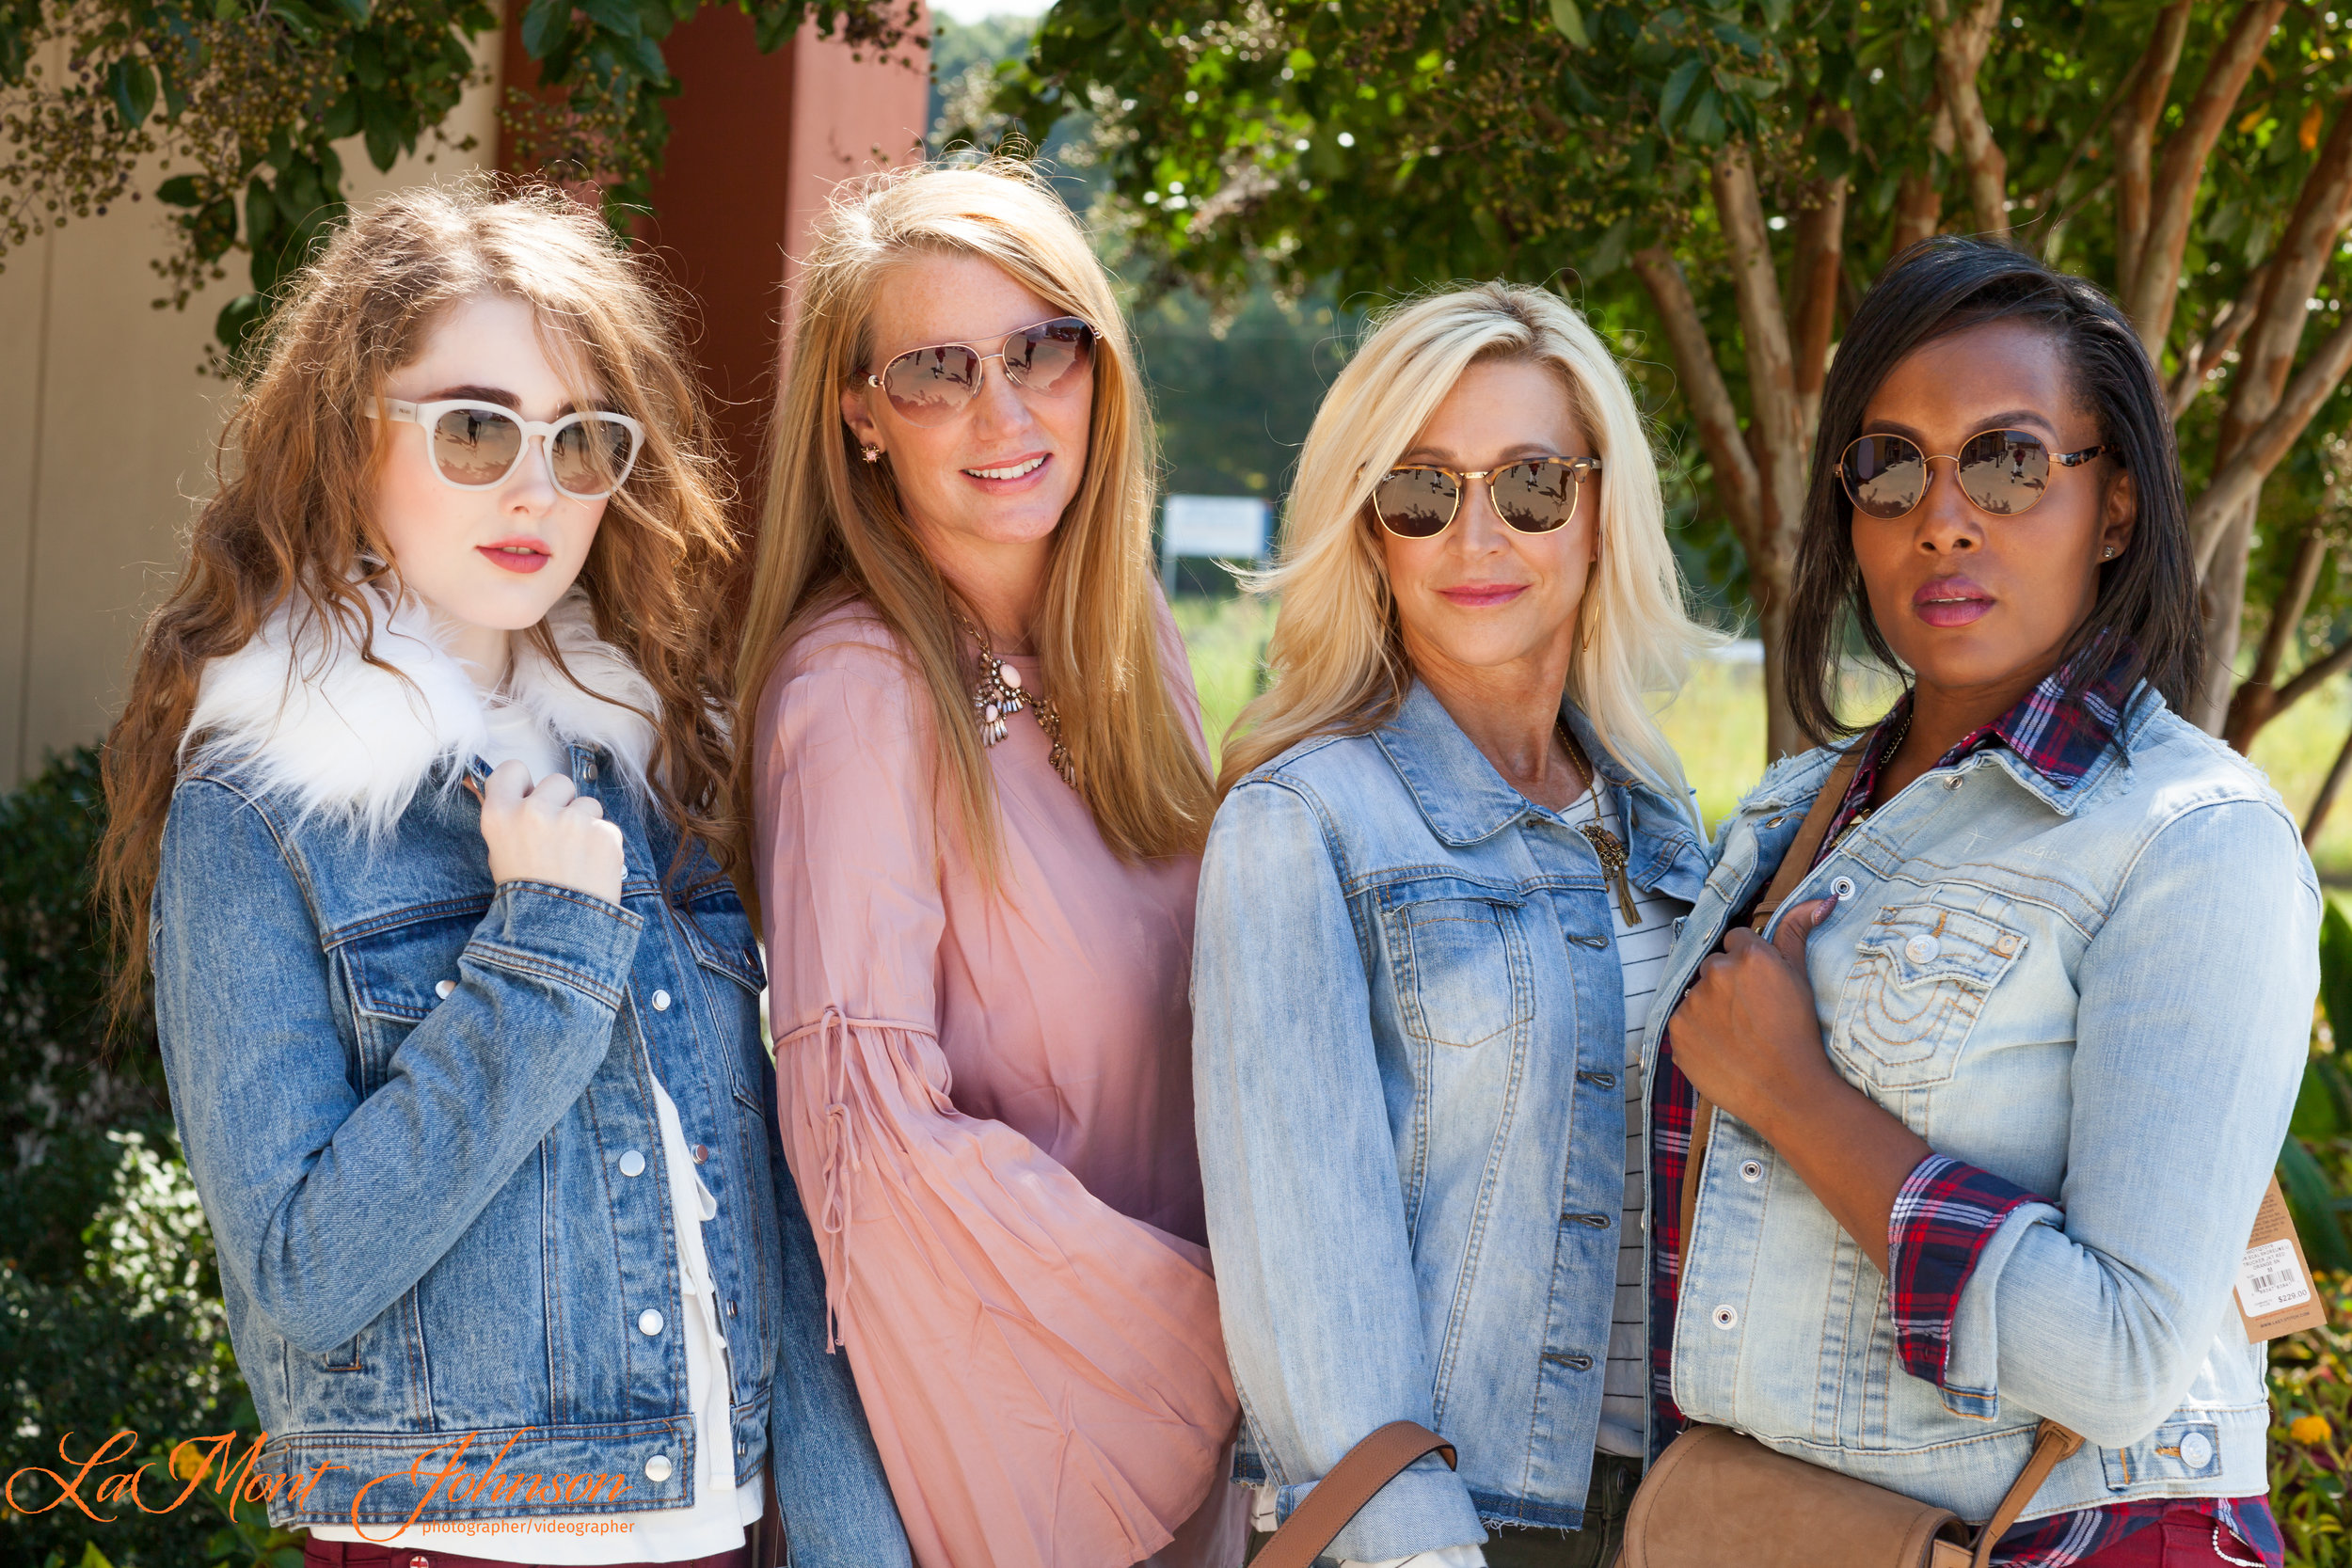 Tanger Fall Fashion Shoot